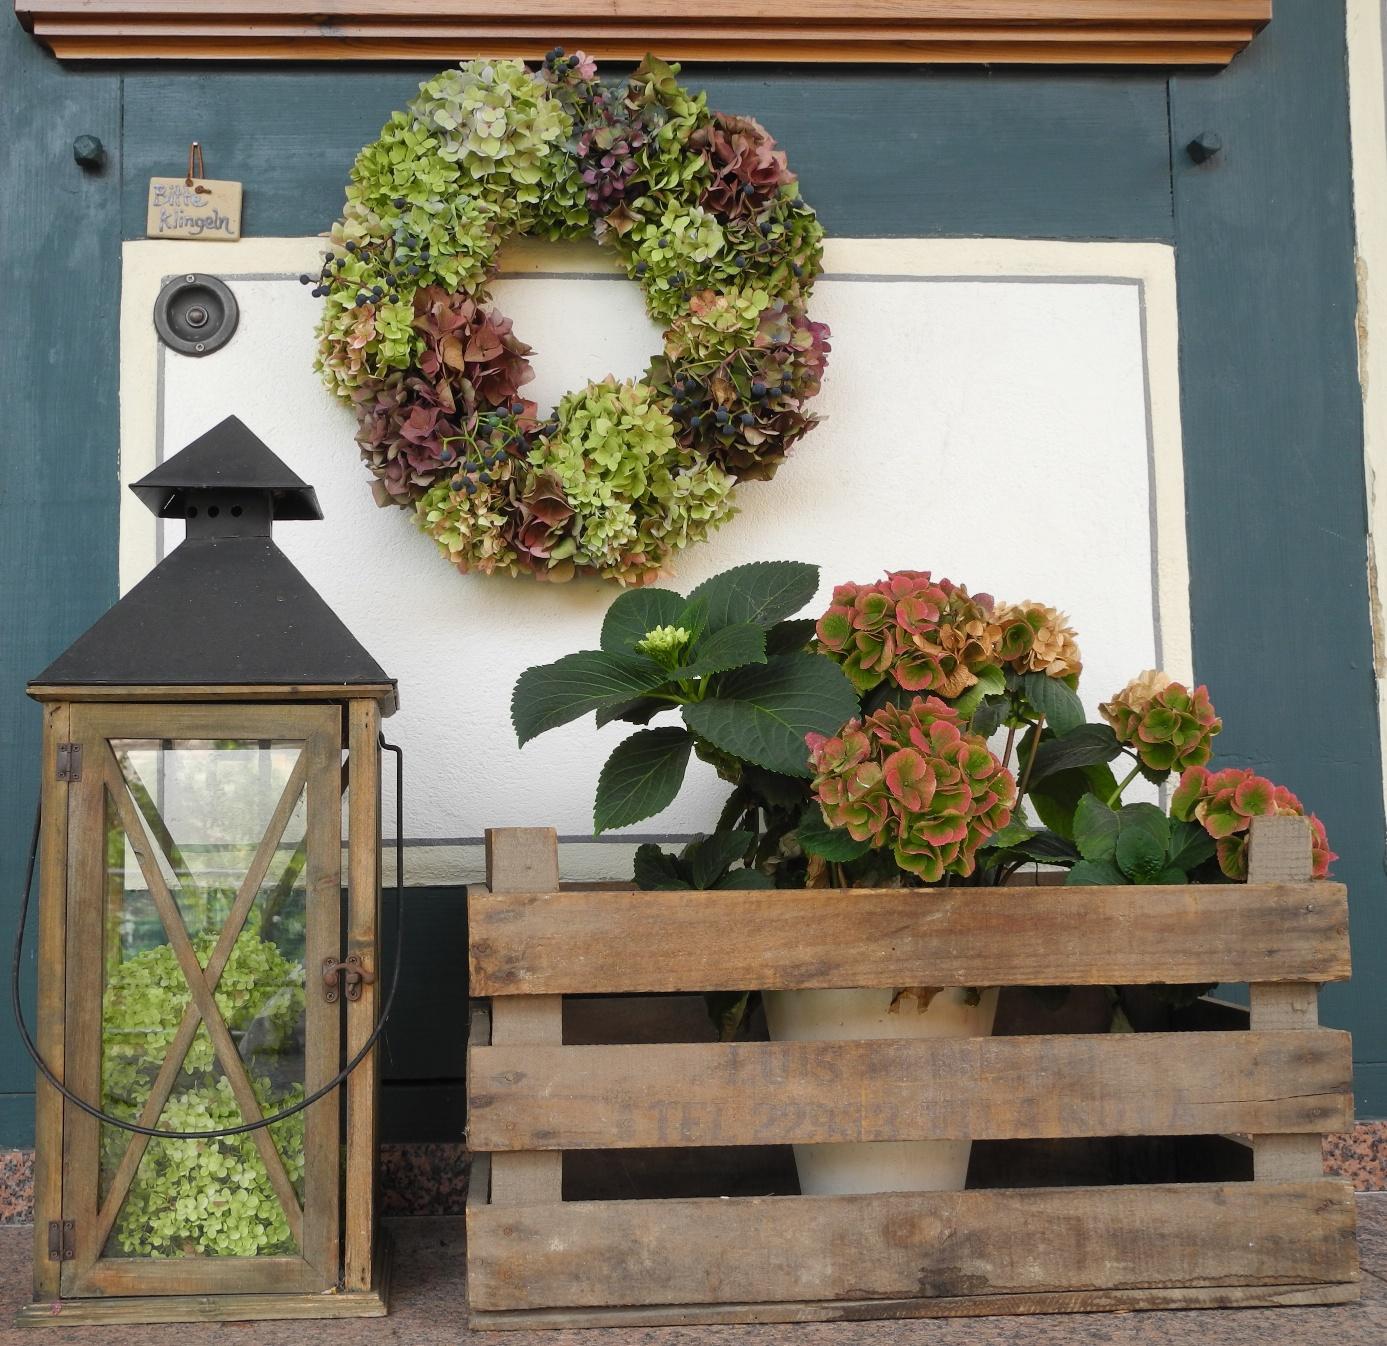 hortensien trocknen hortensien trocknen flora hortensien. Black Bedroom Furniture Sets. Home Design Ideas